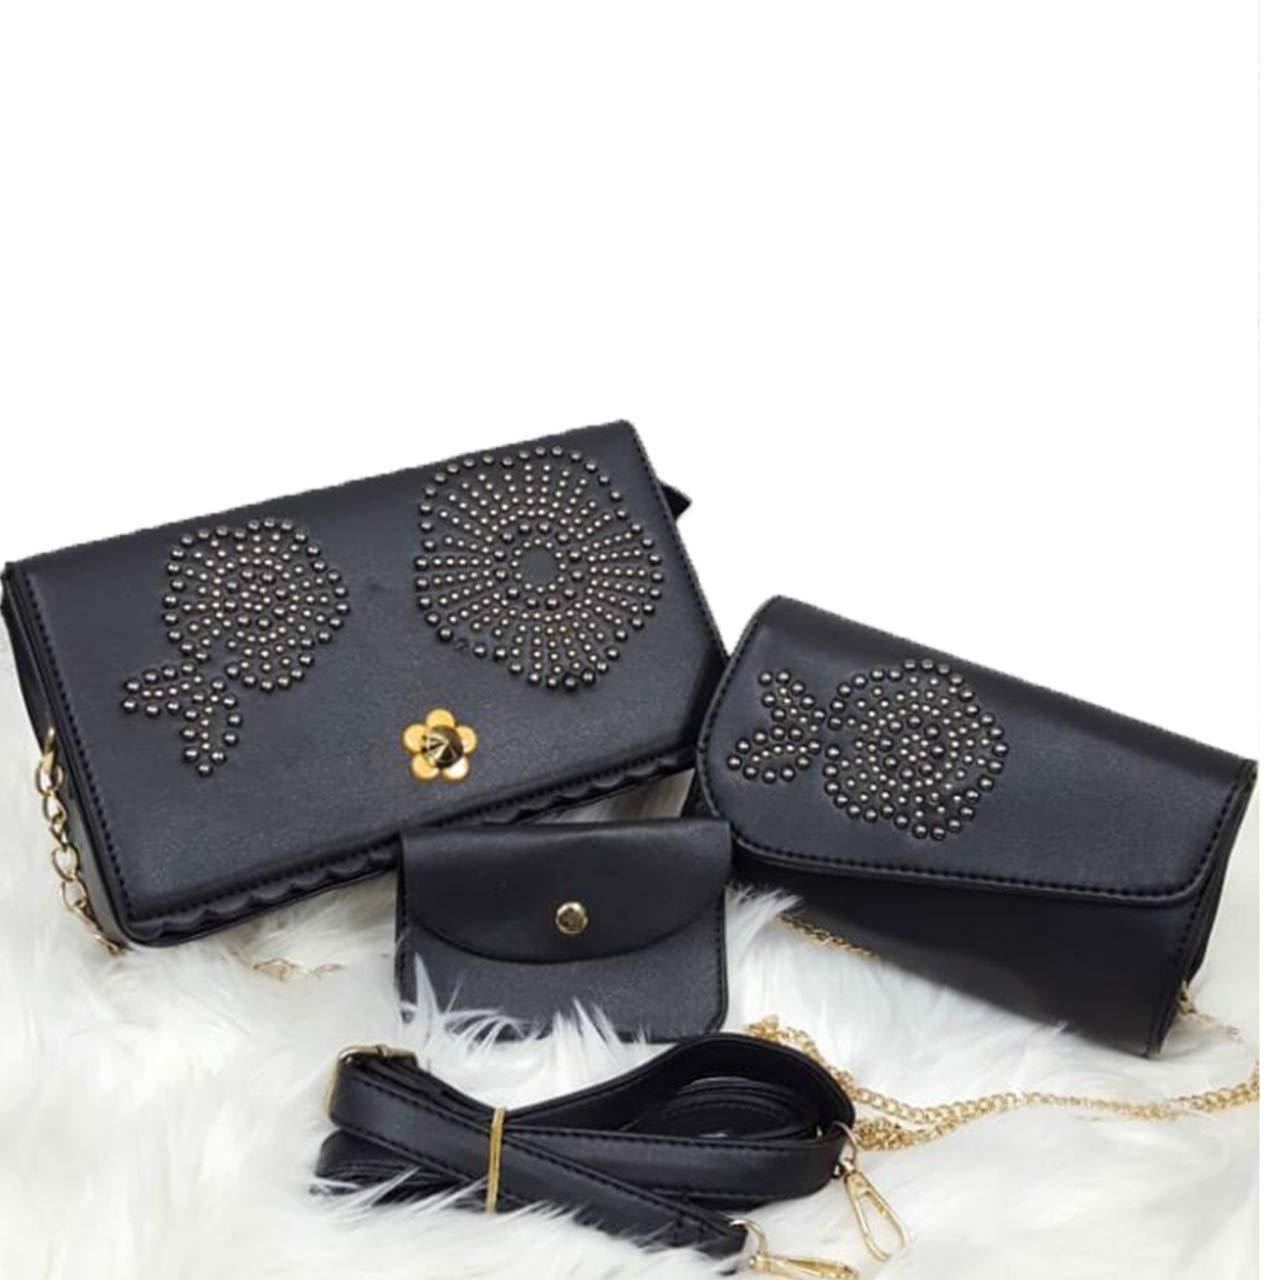 Handbag Organizer Insert Purse Insert Womens Purse Organizer 3 Piece Set Makeup Bag Fashionlover Bag in Bag Wristlet